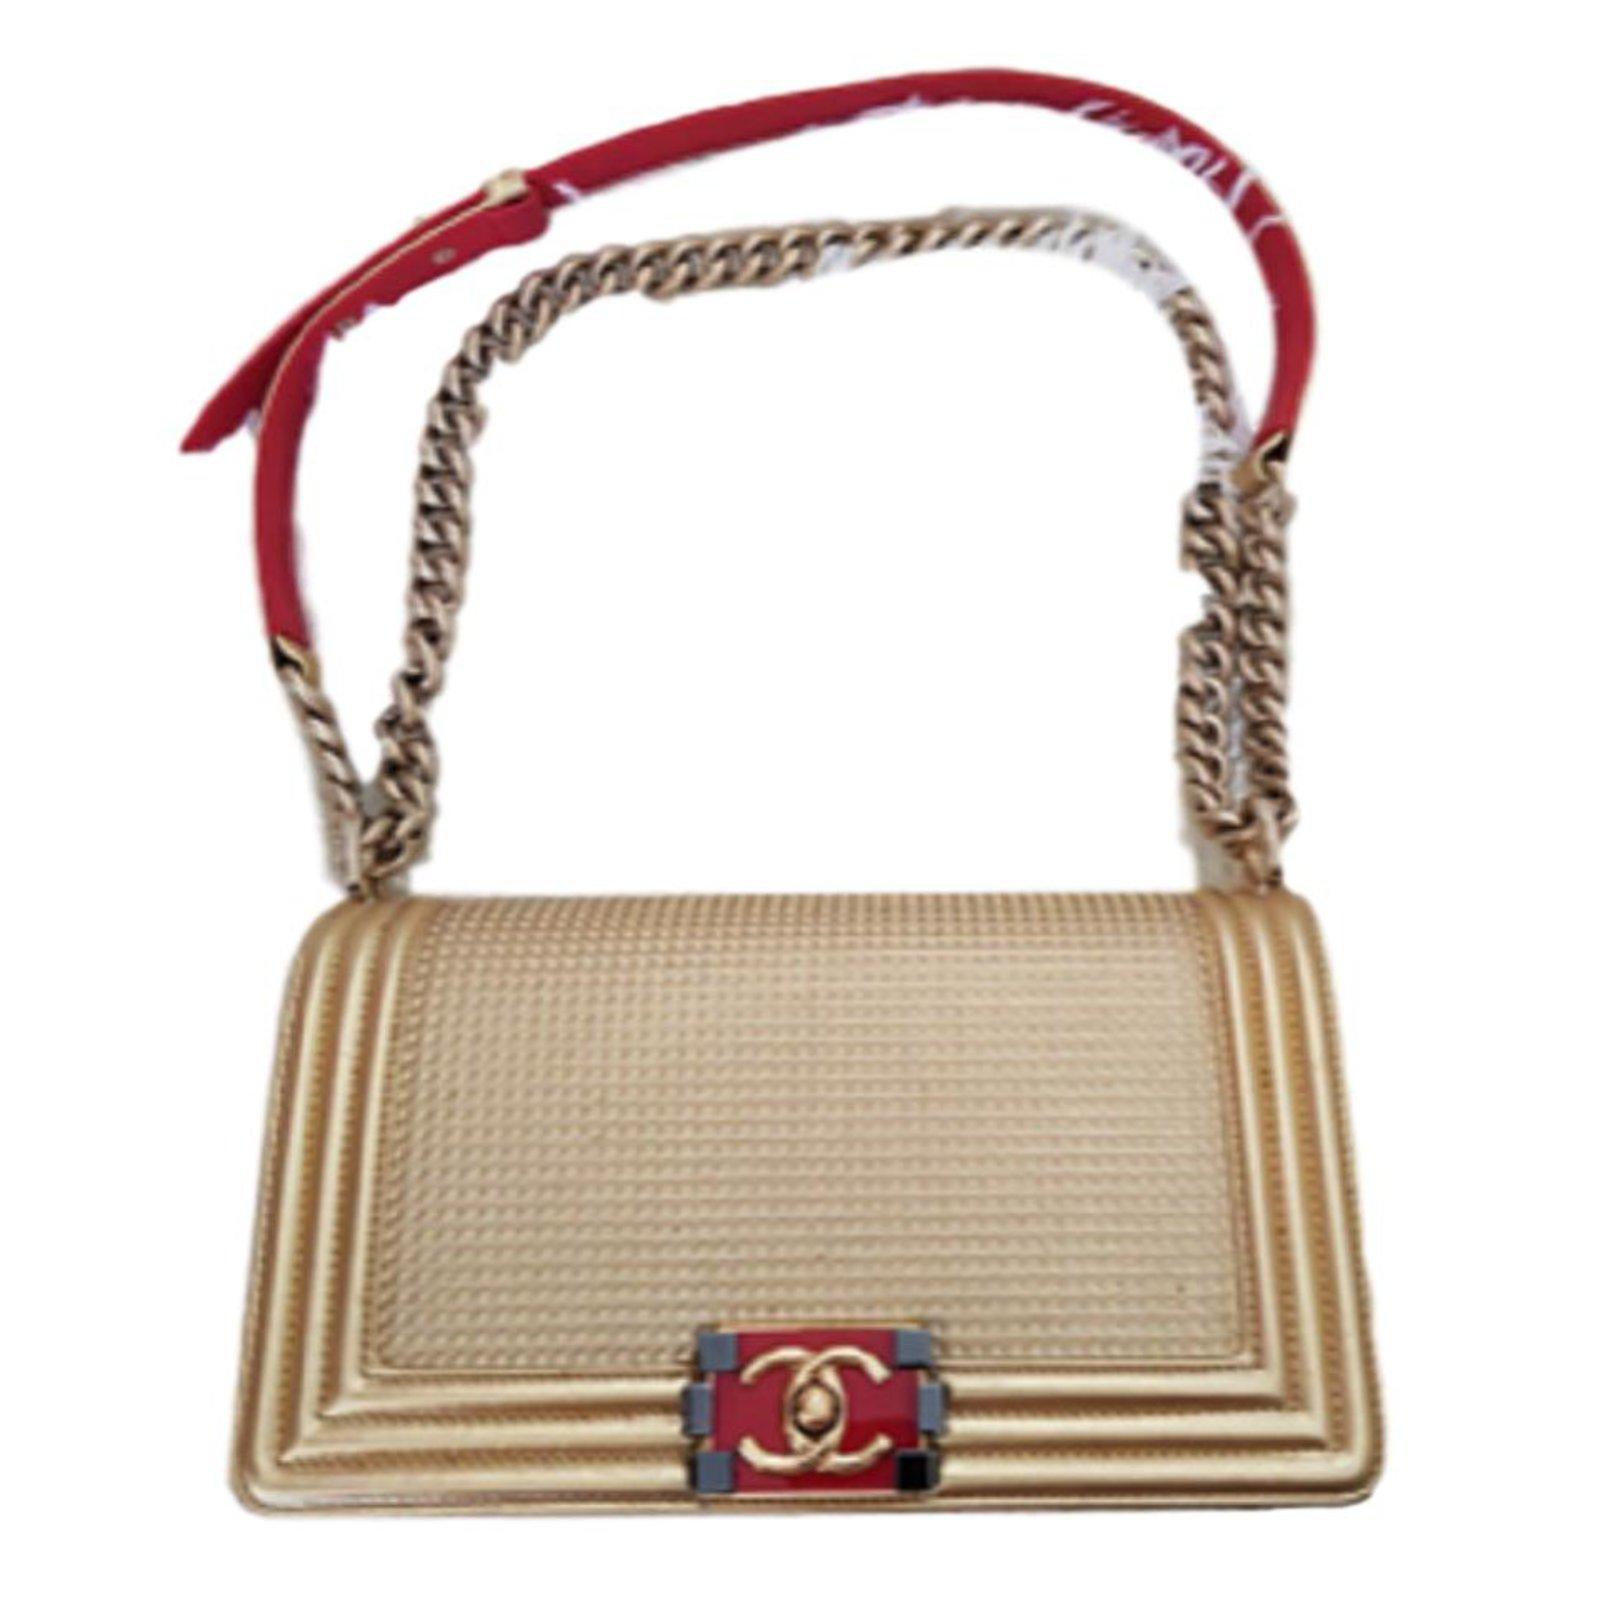 Chanel Dubai Gold Medium Boy Bag